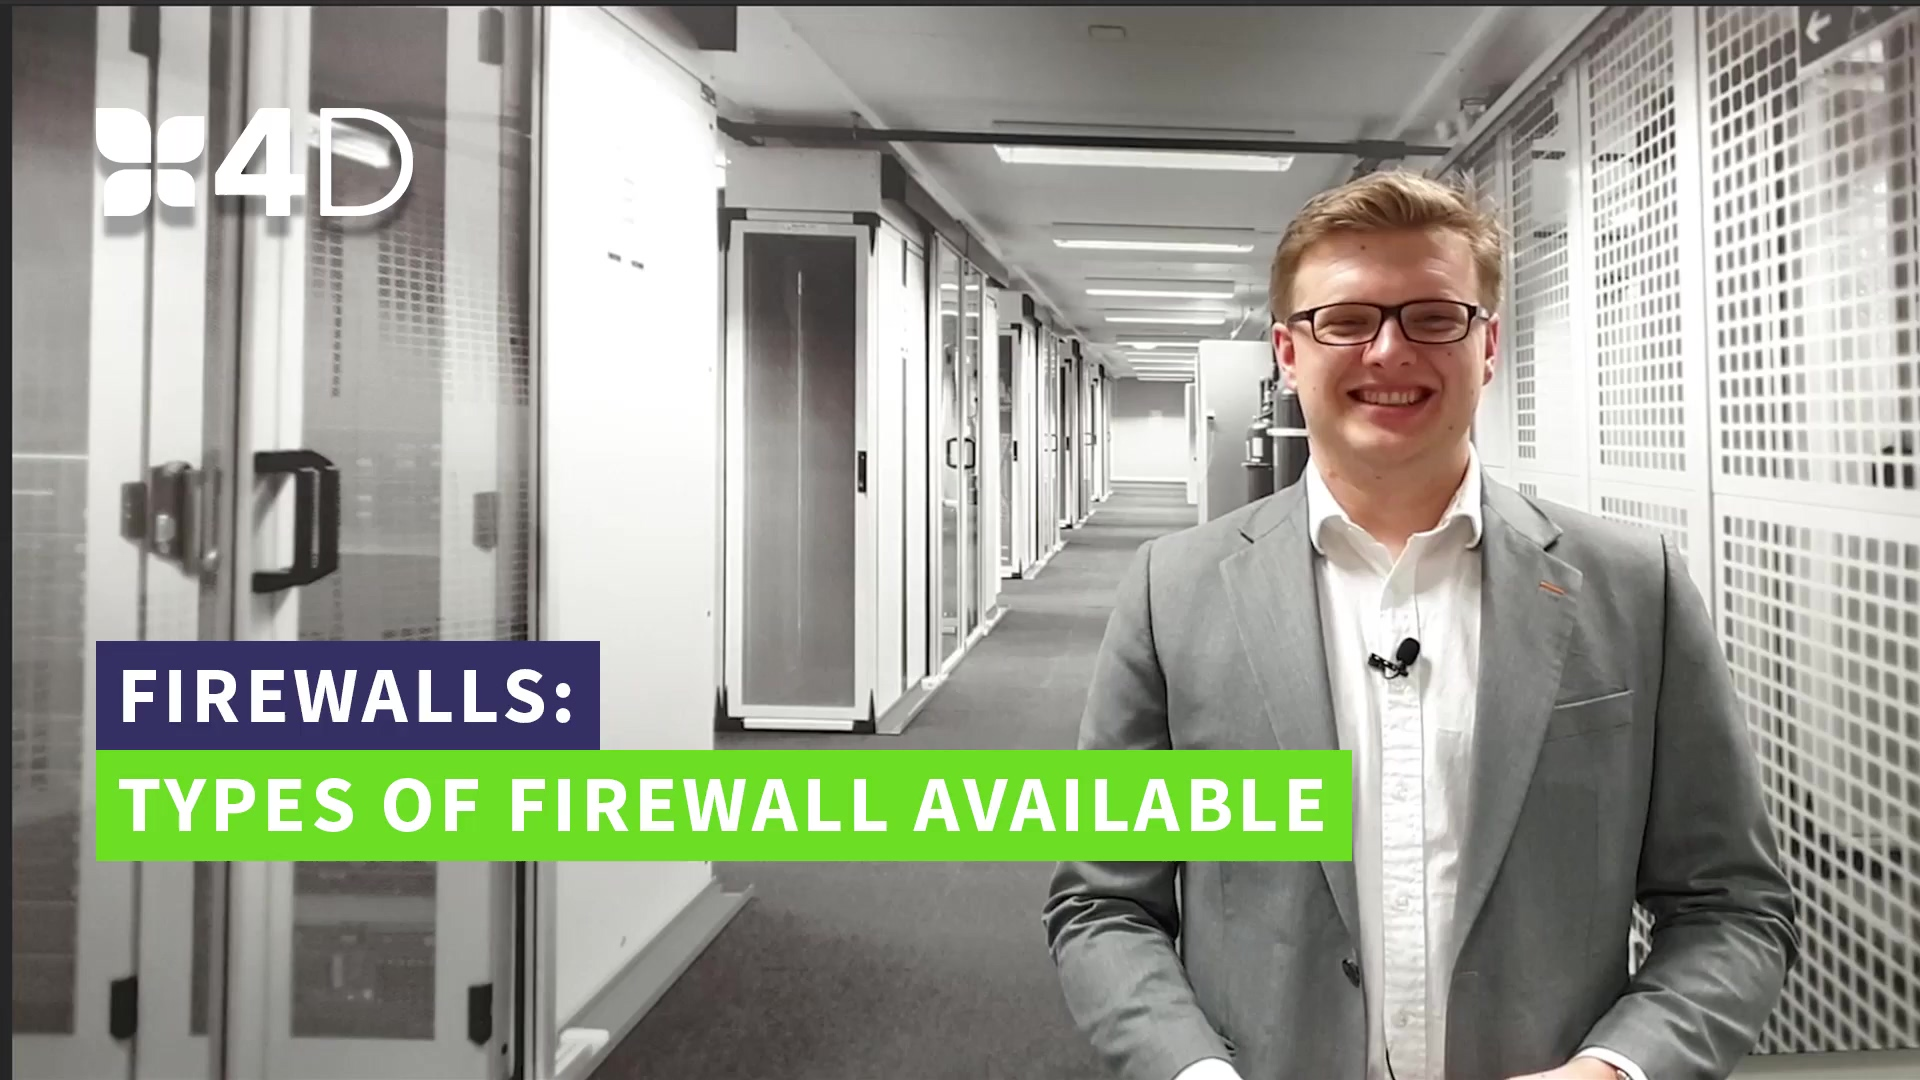 4D - Types of Firewalls - DB(Subtitled)-1